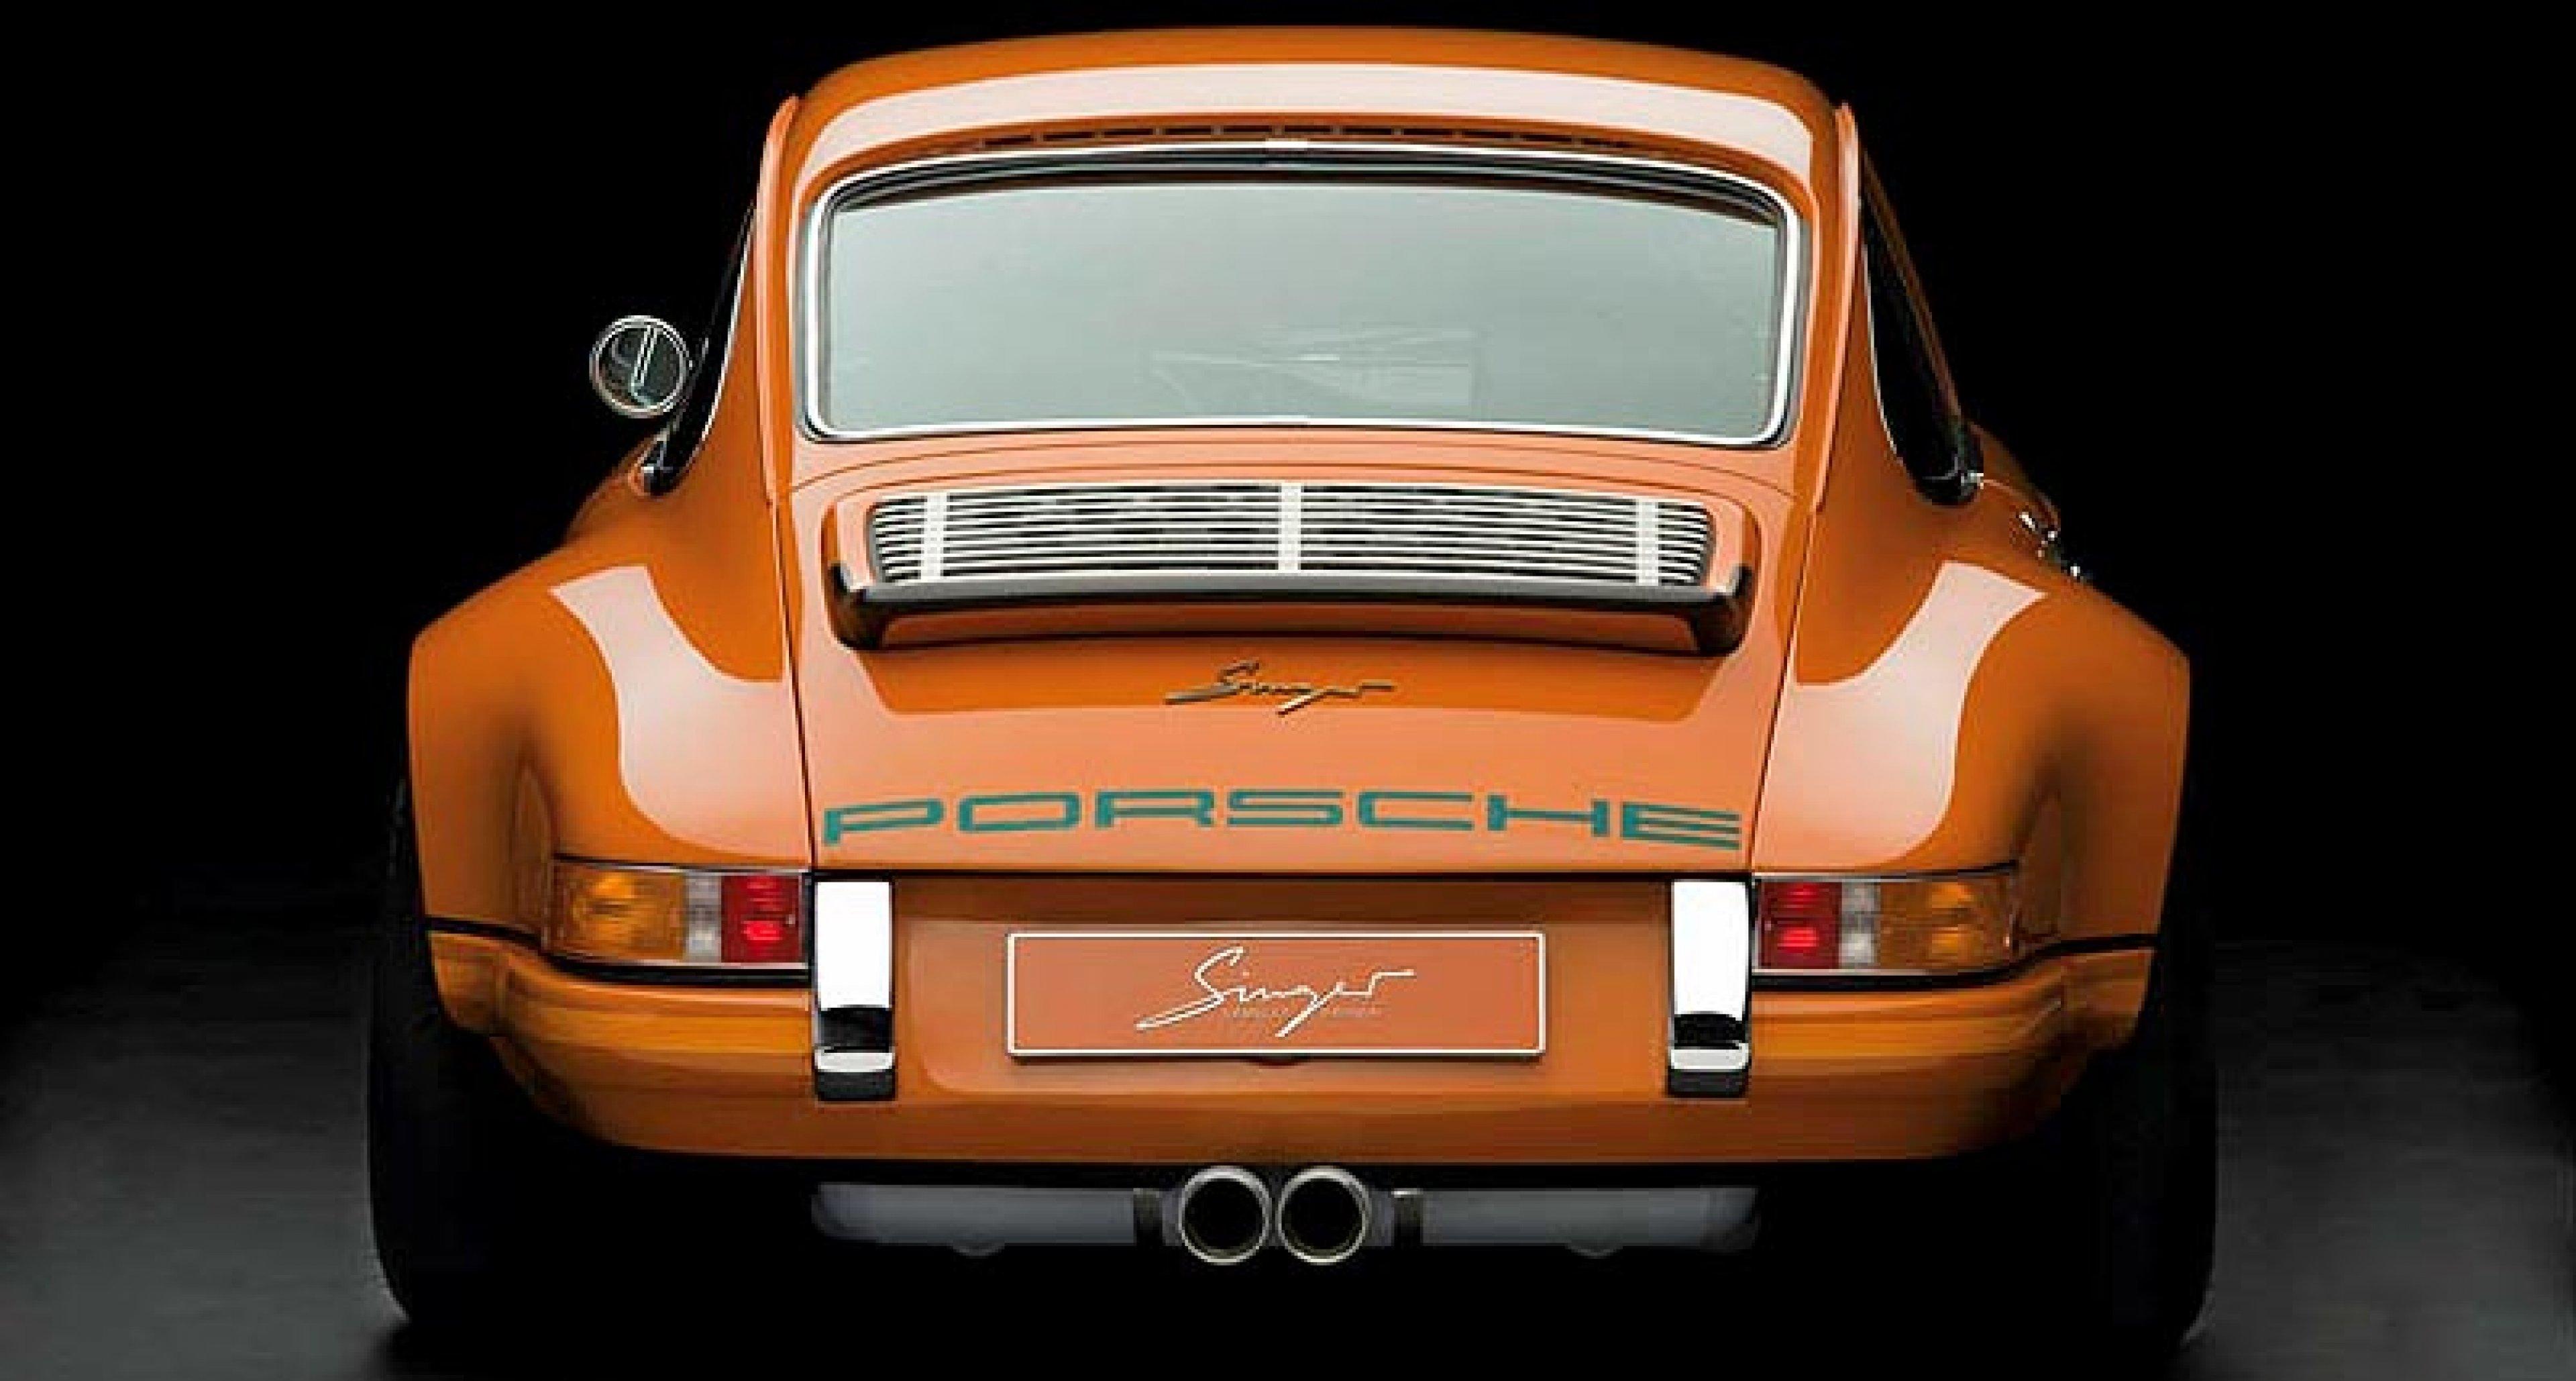 singer porsche 911 classic driver magazine. Black Bedroom Furniture Sets. Home Design Ideas